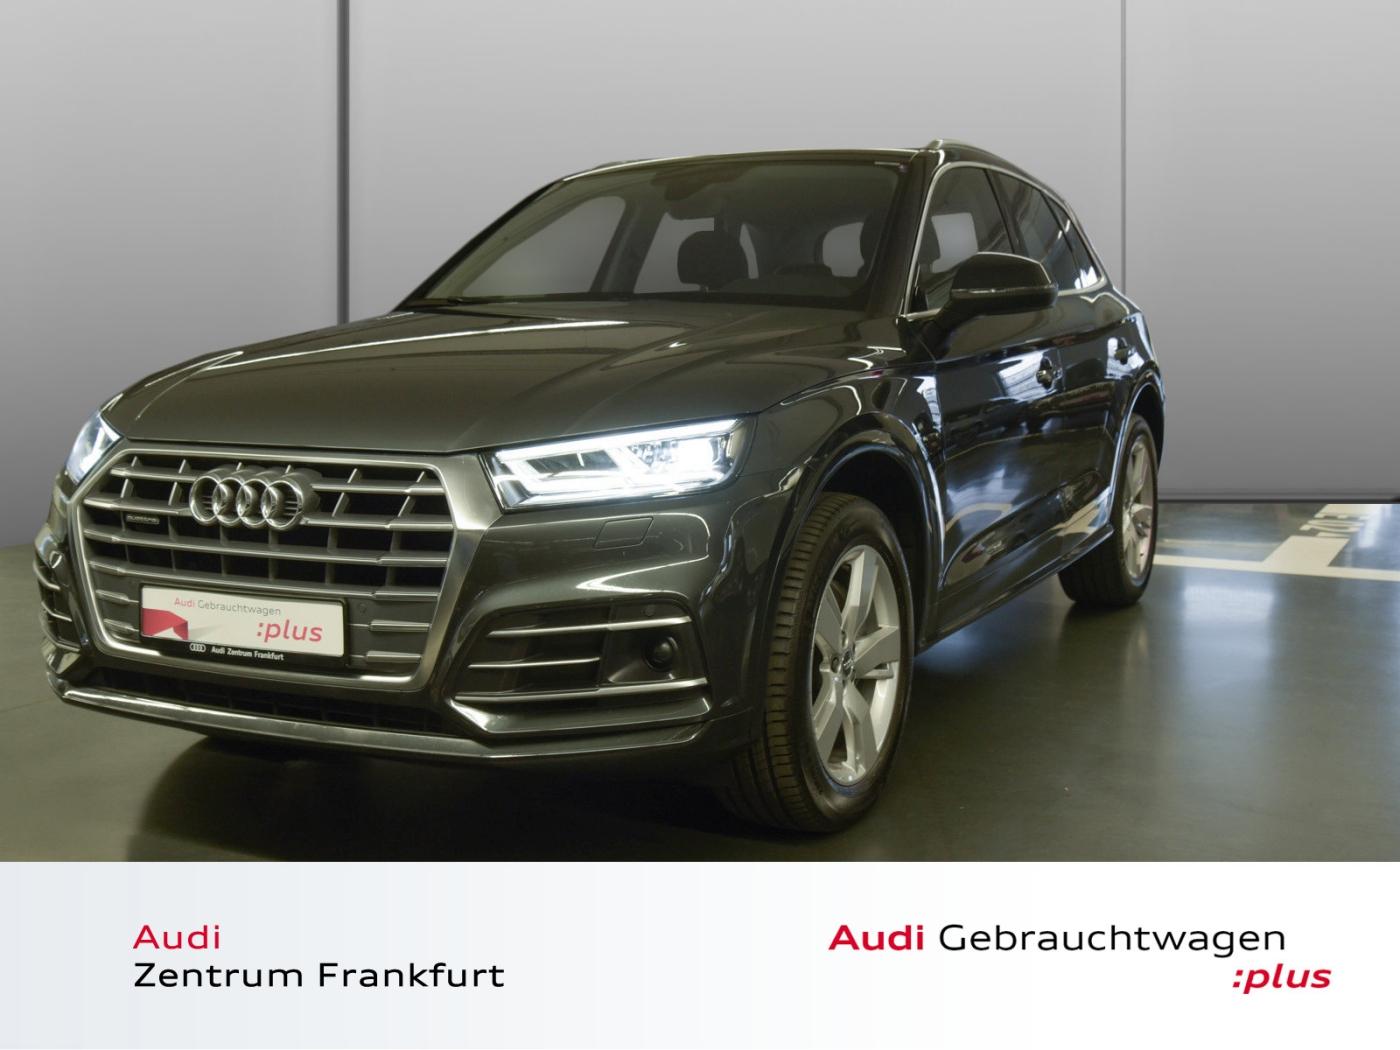 Audi Q5 2.0 TDI quattro S tronic S line LED Navi PDC, Jahr 2018, Diesel